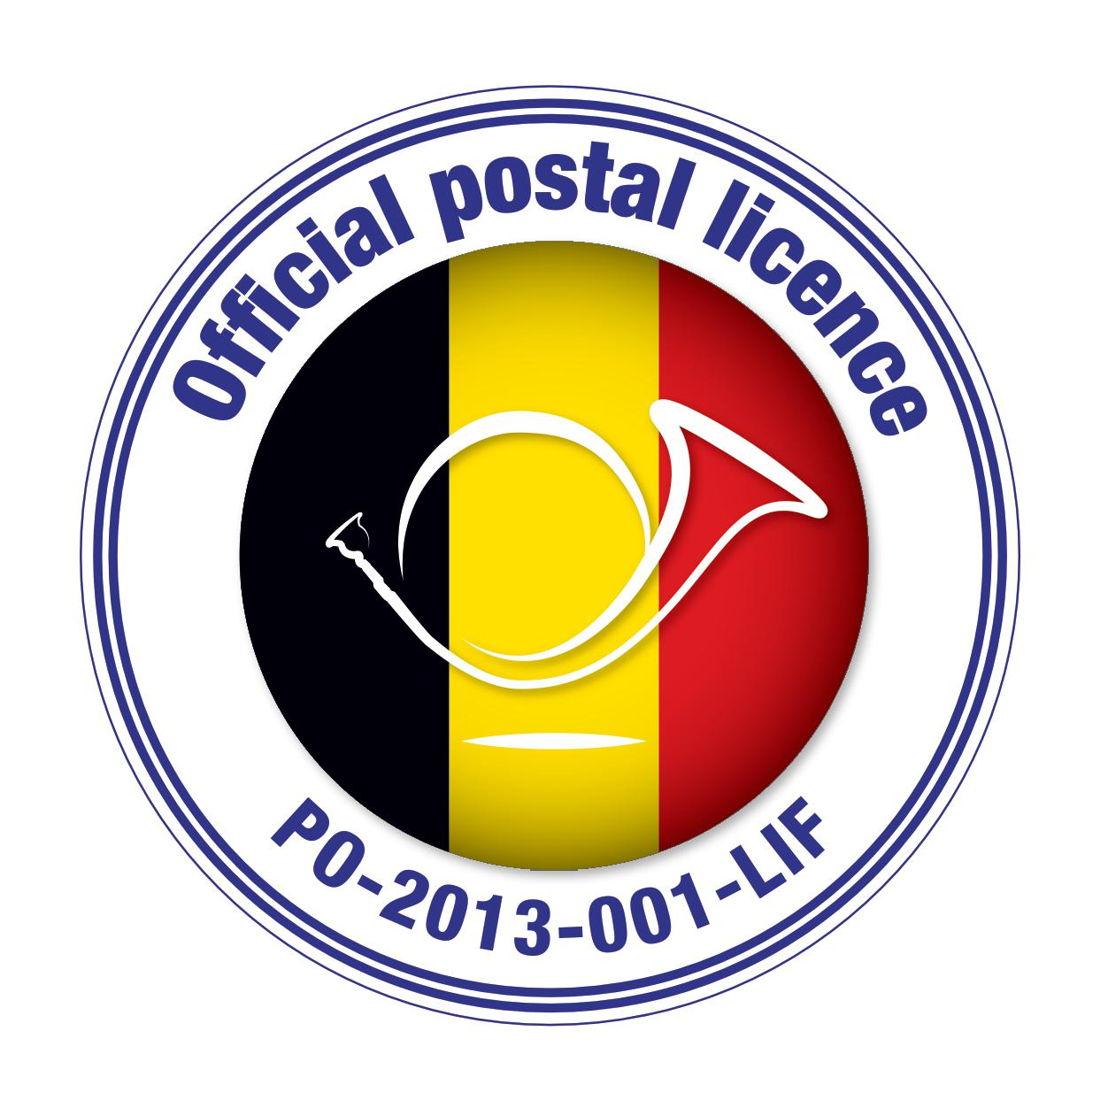 Individuele postvergunning sinds 22 mei 2013